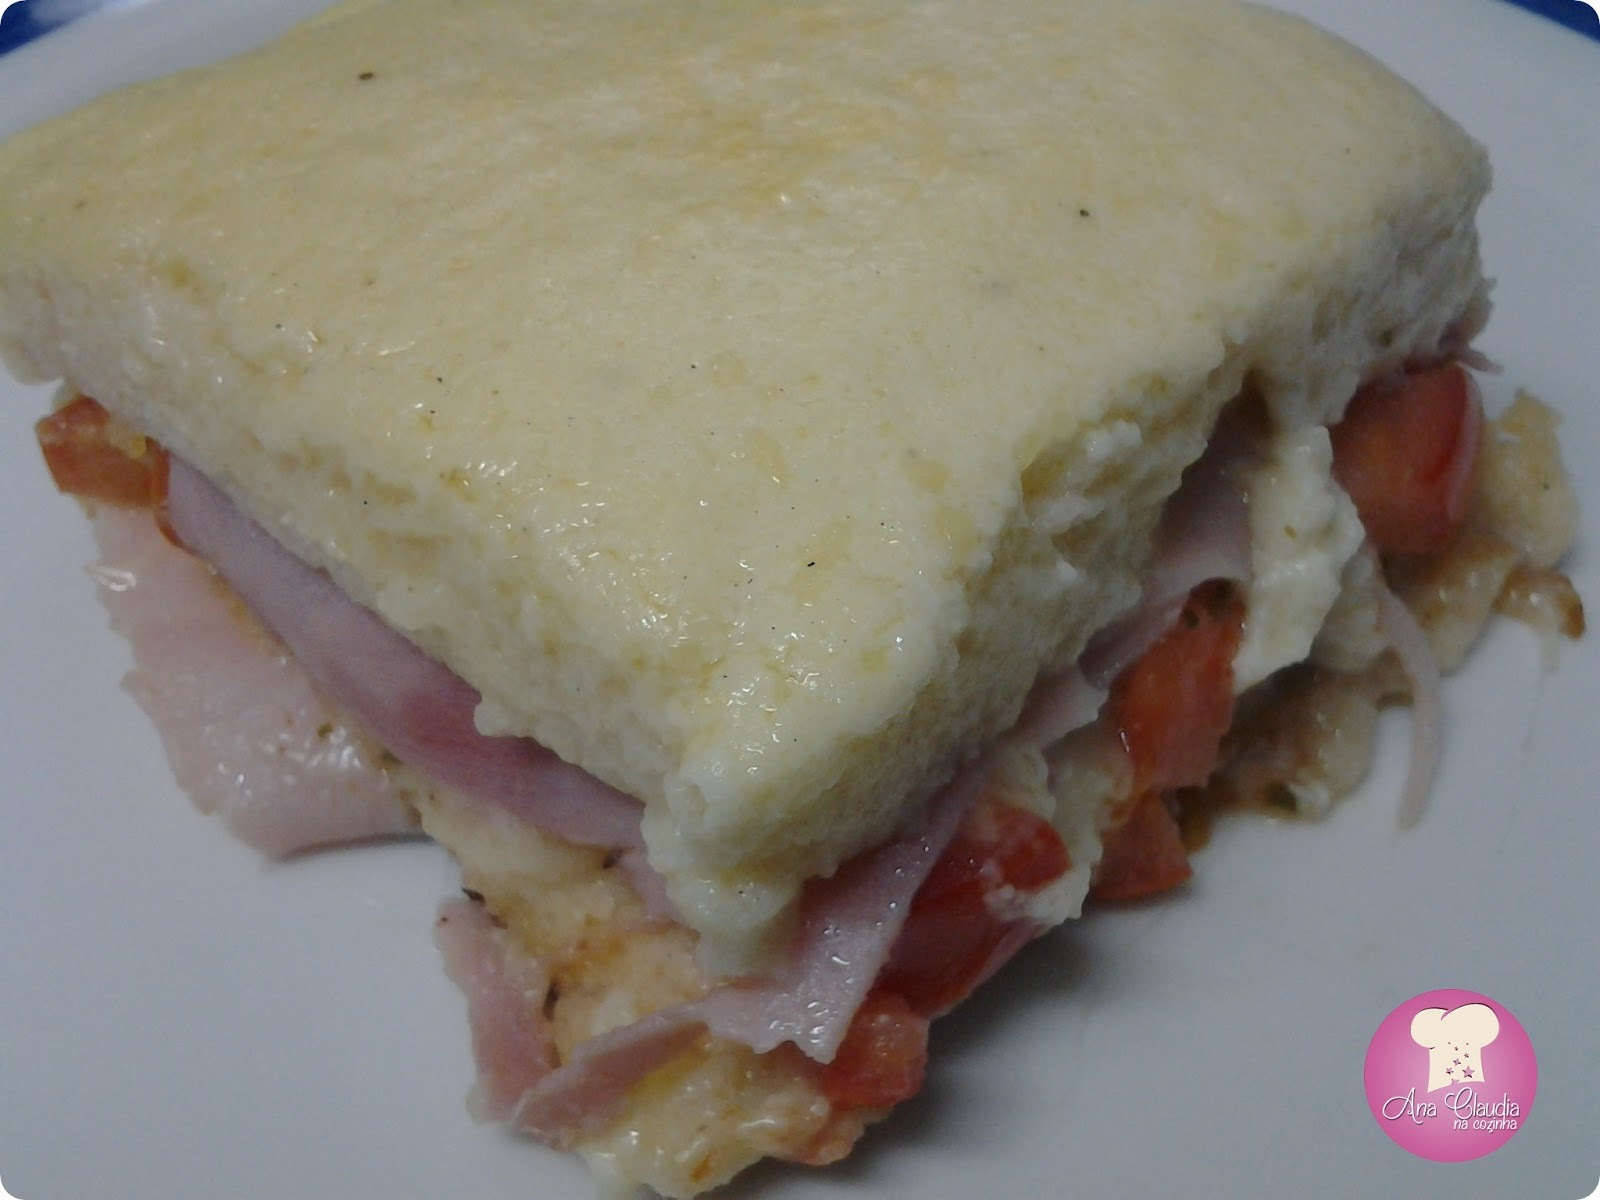 sanduíche bauru de forno